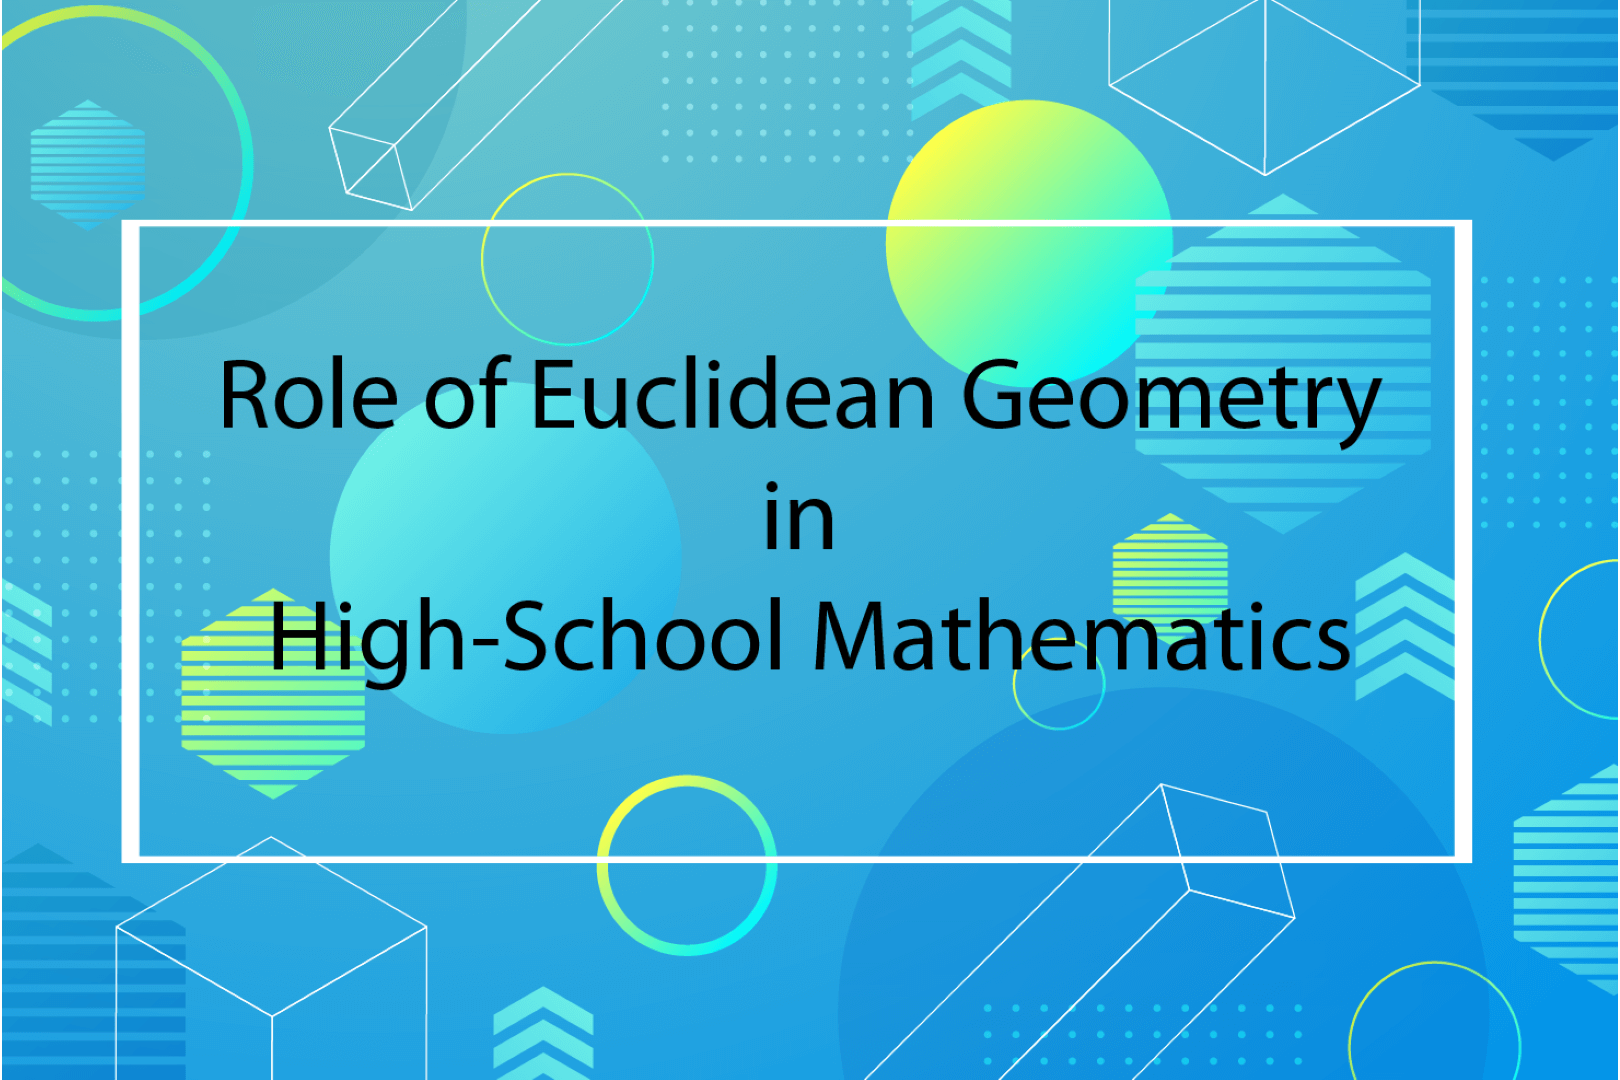 Role of Euclidean Geometry in High-School Mathematics